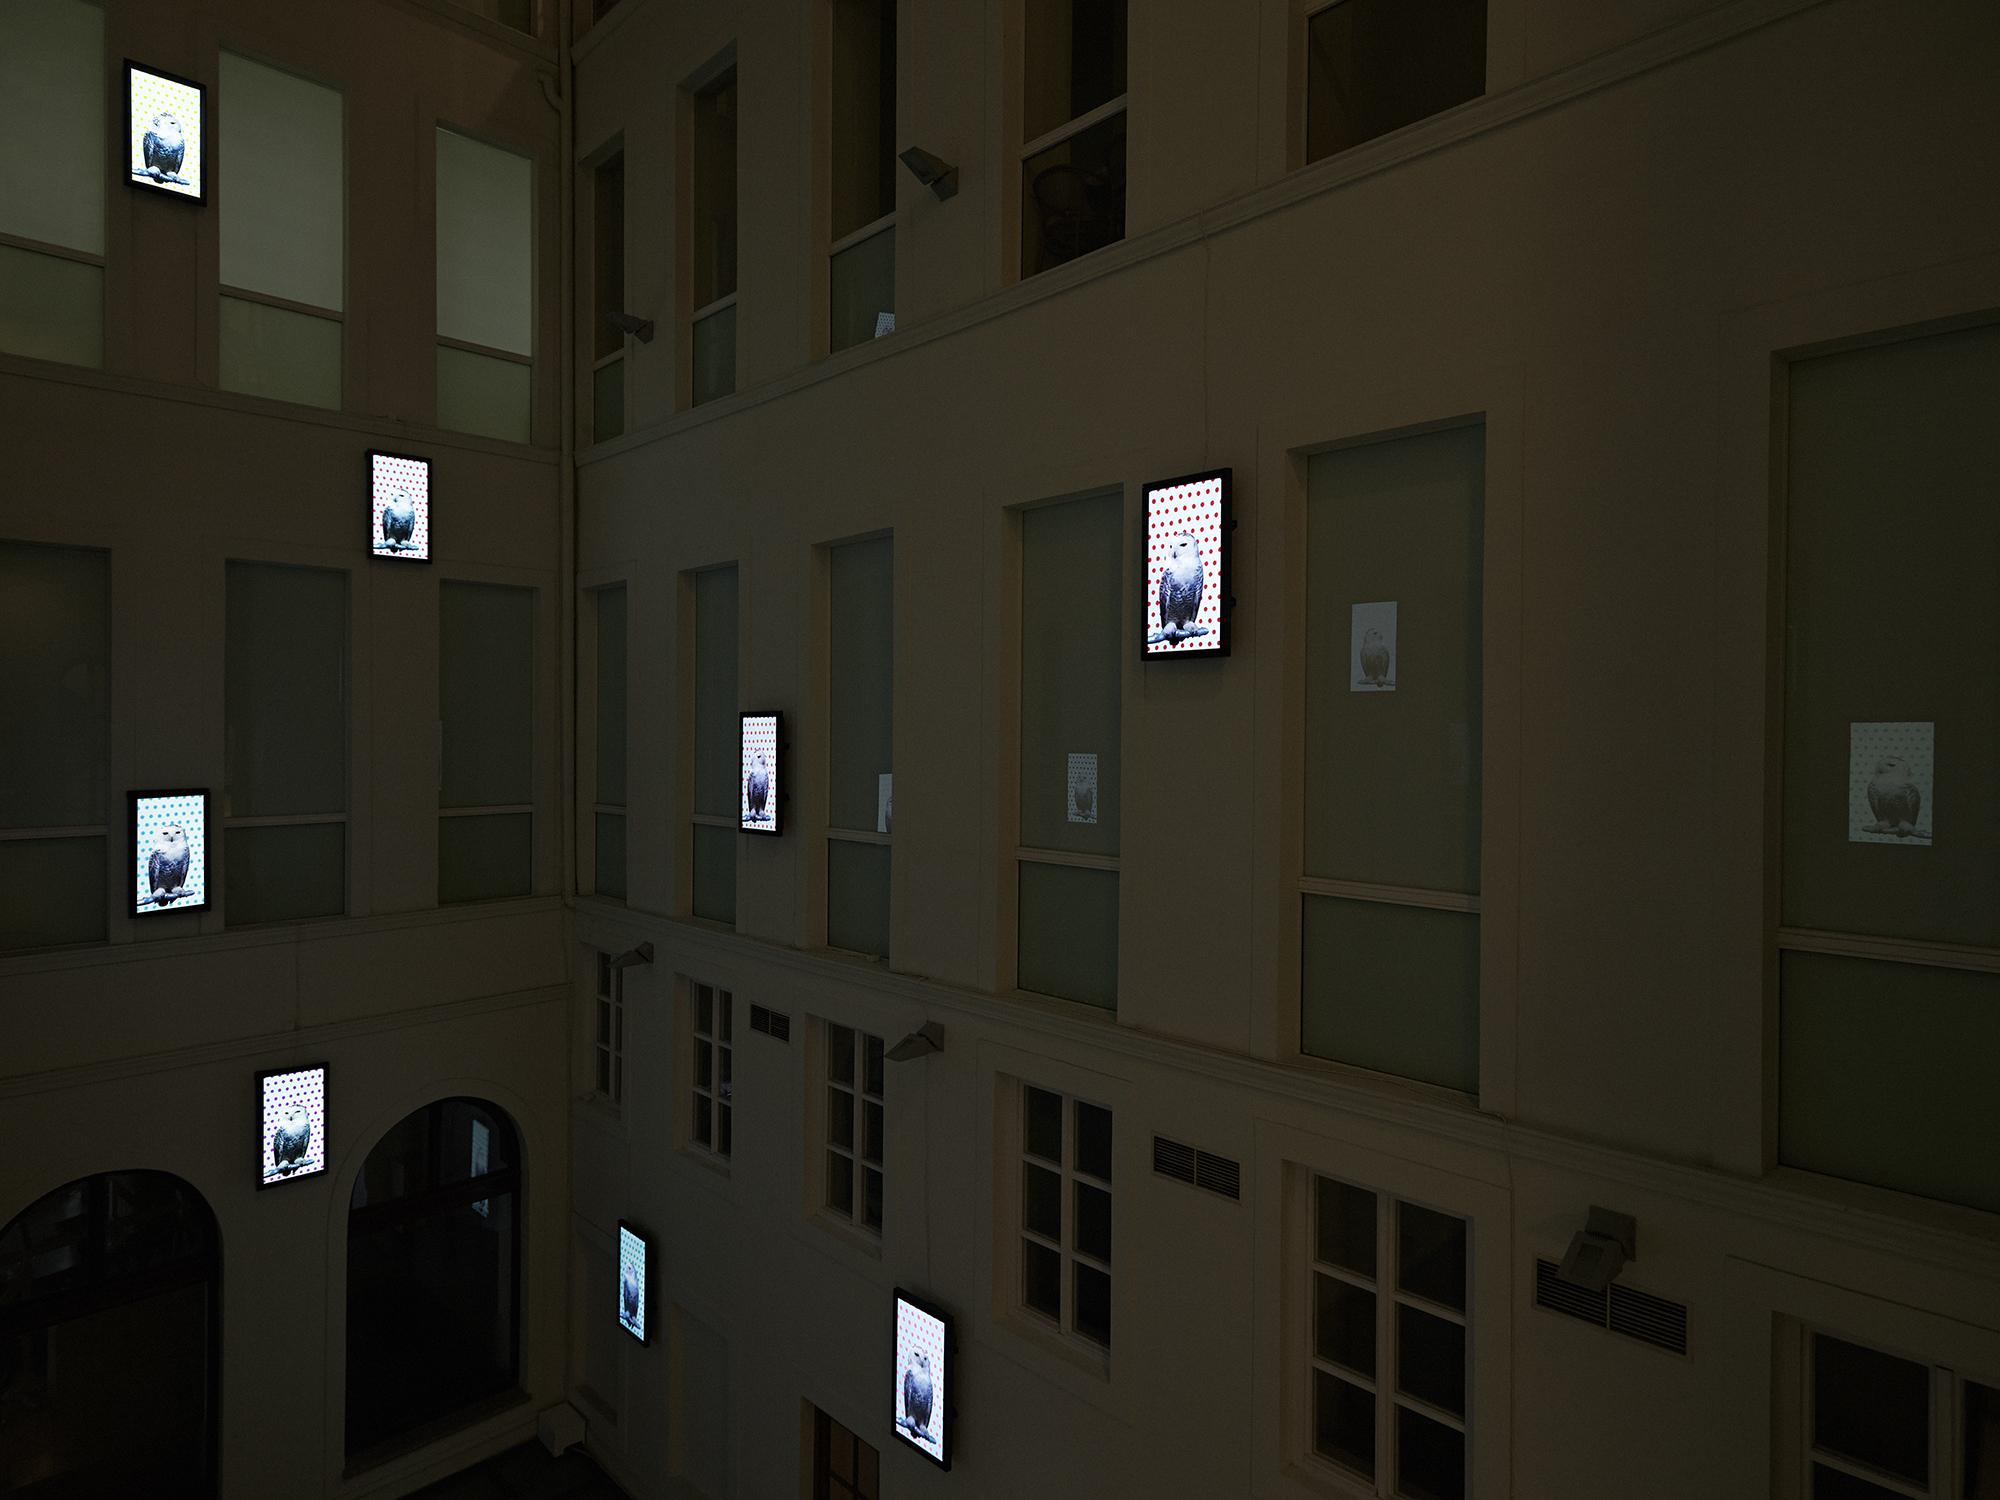 Robert_Willson_exhibition_12.jpg